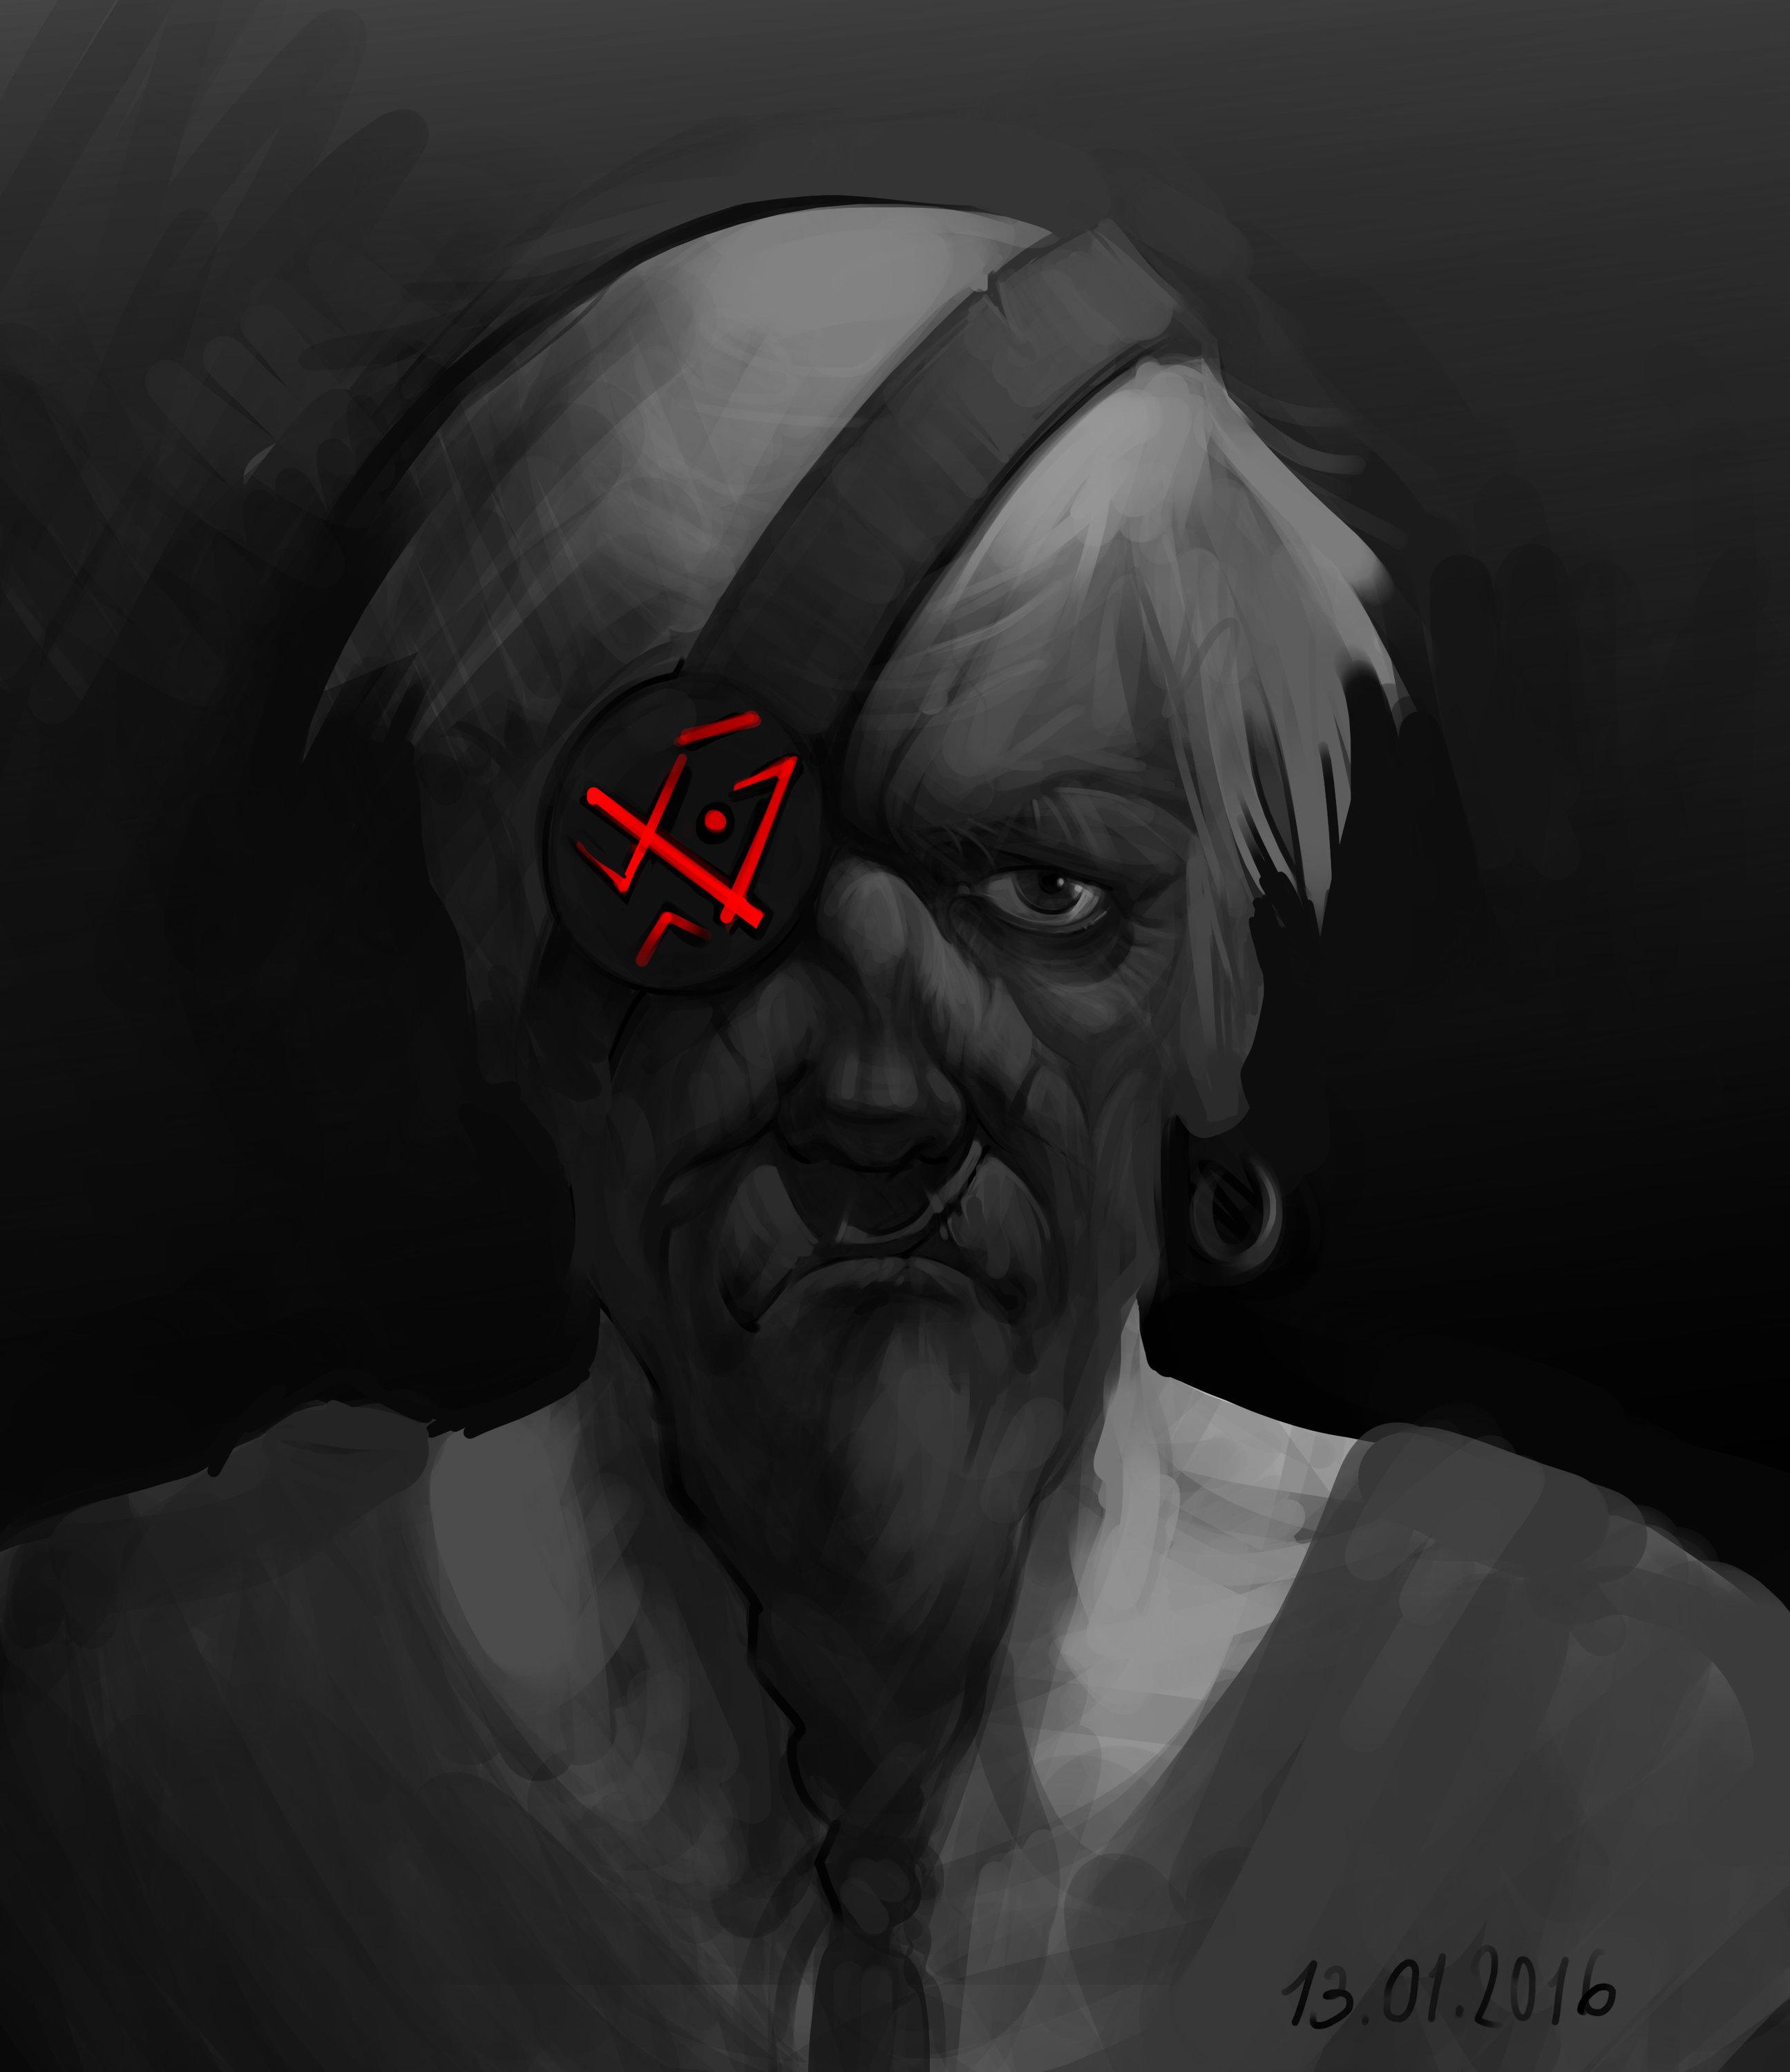 Old pirate_5.jpg